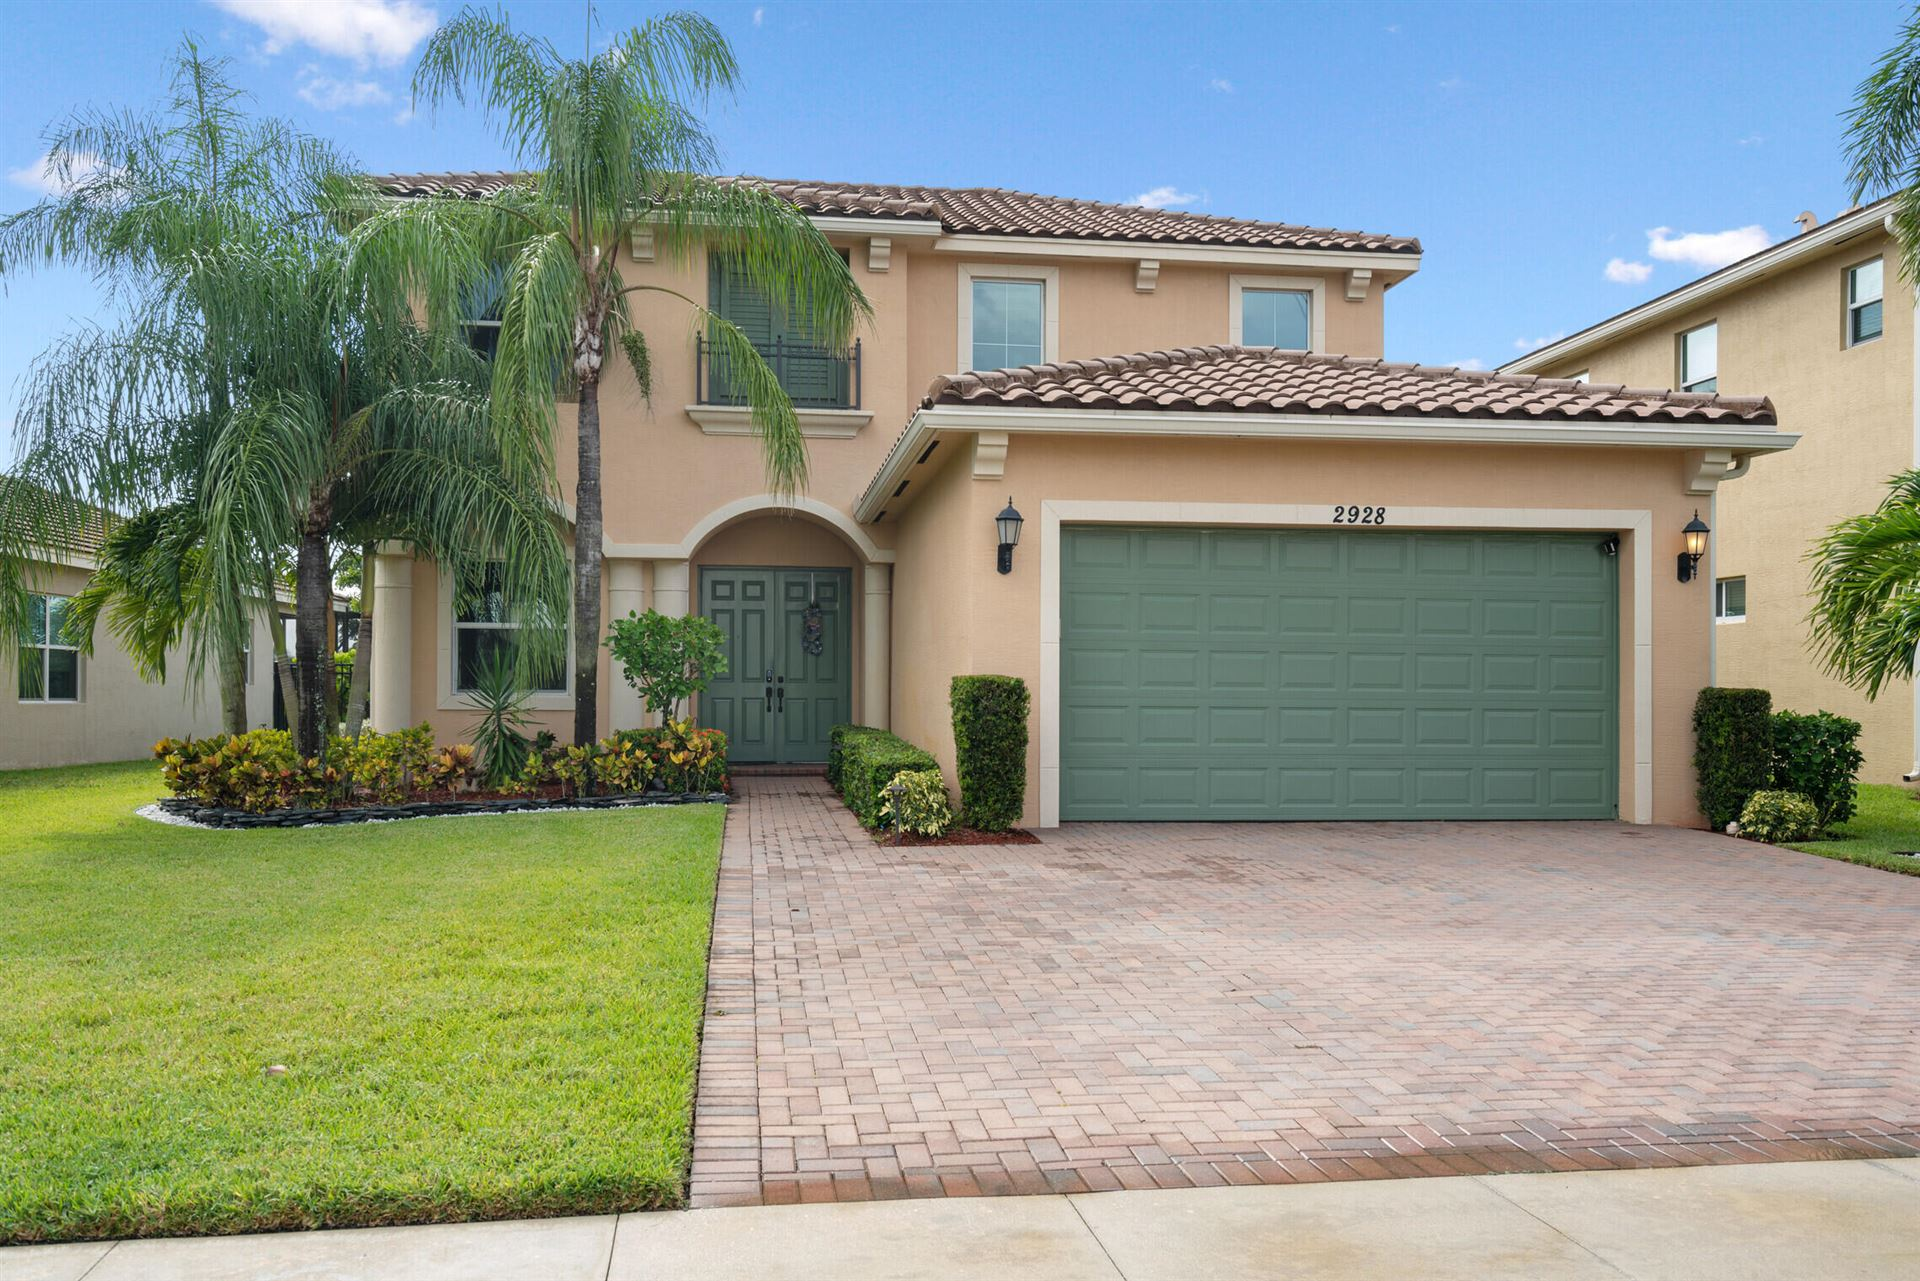 2928 Bellarosa Circle, Royal Palm Beach, FL 33411 - MLS#: RX-10745246